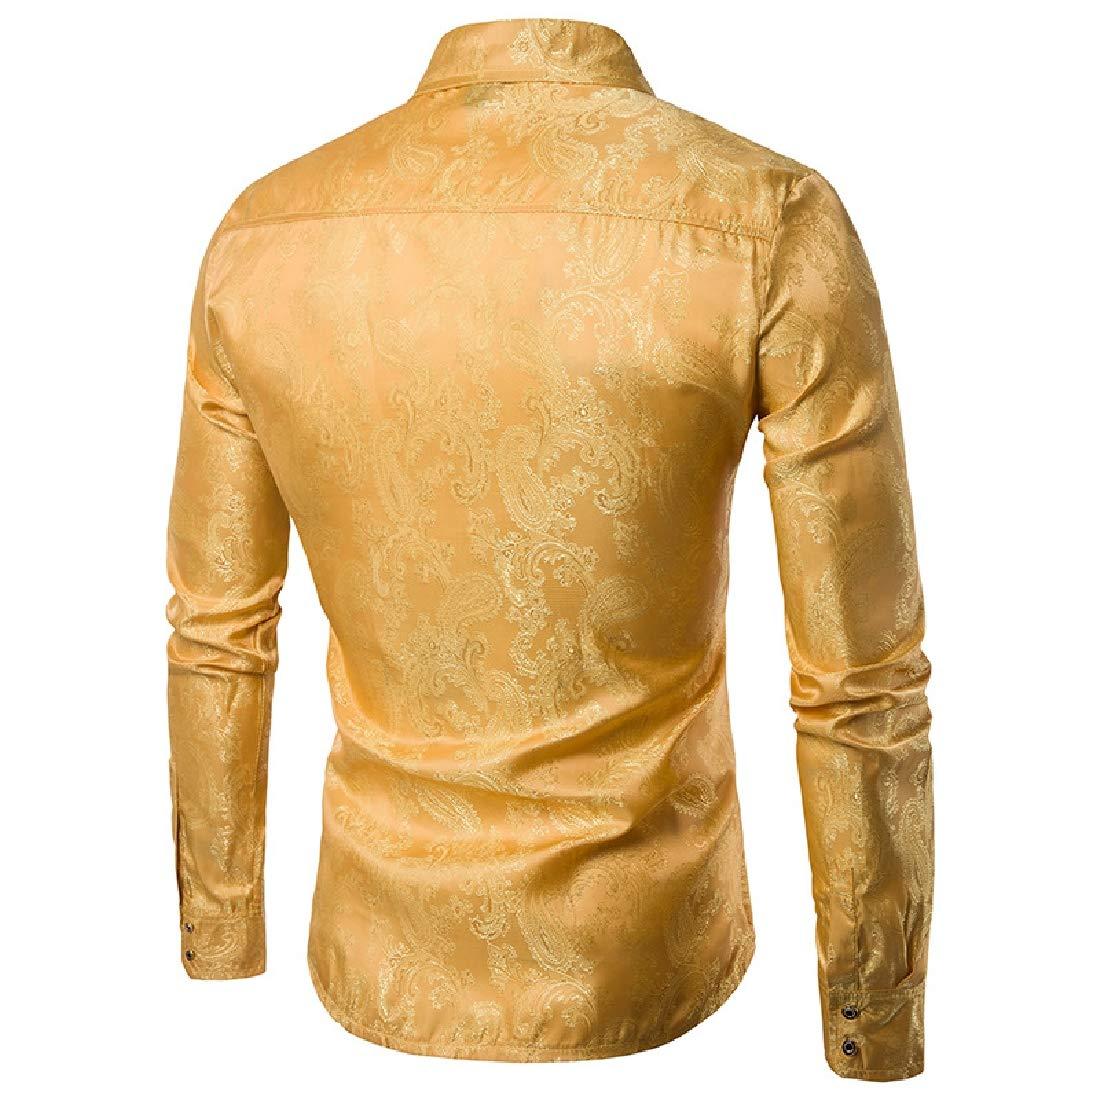 Mfasica Mens Glitter Long-Sleeve Lapel Jacquard Nightclub Western Shirt